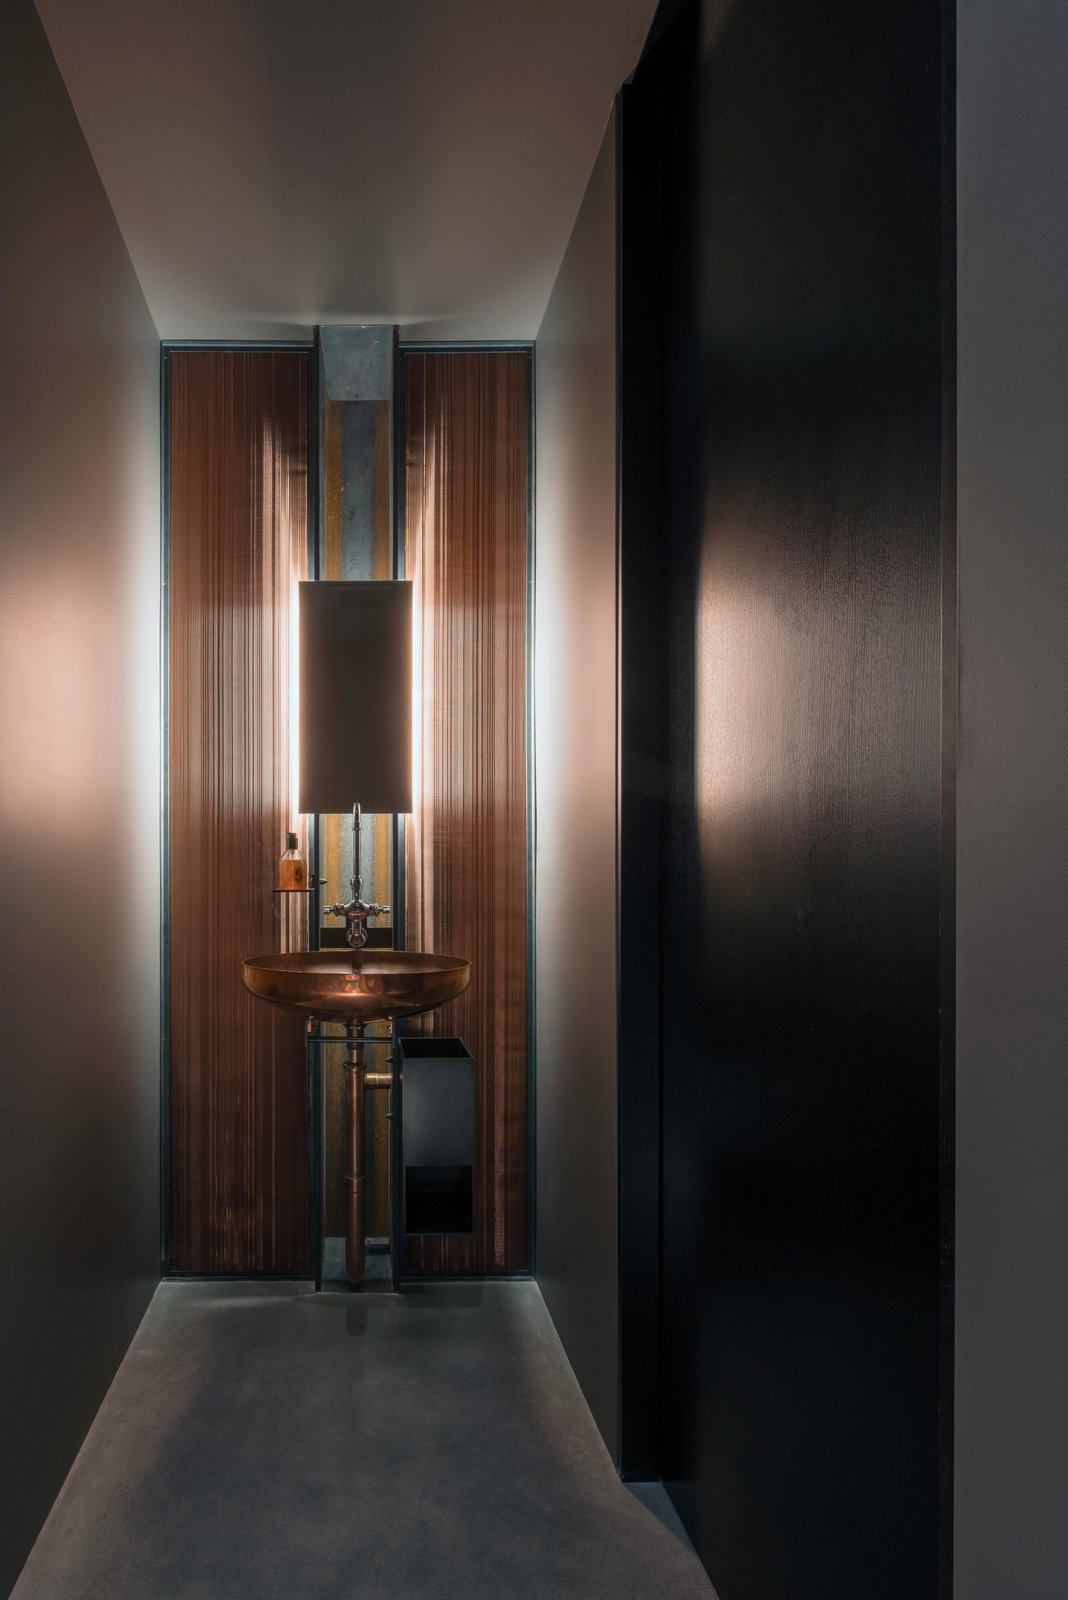 Bath Room, Metal Counter, Concrete Floor, Wall Mount Sink, Recessed Lighting, Wall Lighting, Accent Lighting, and Metal Wall Meg Home | Olson Kundig  Meg Home by Olson Kundig